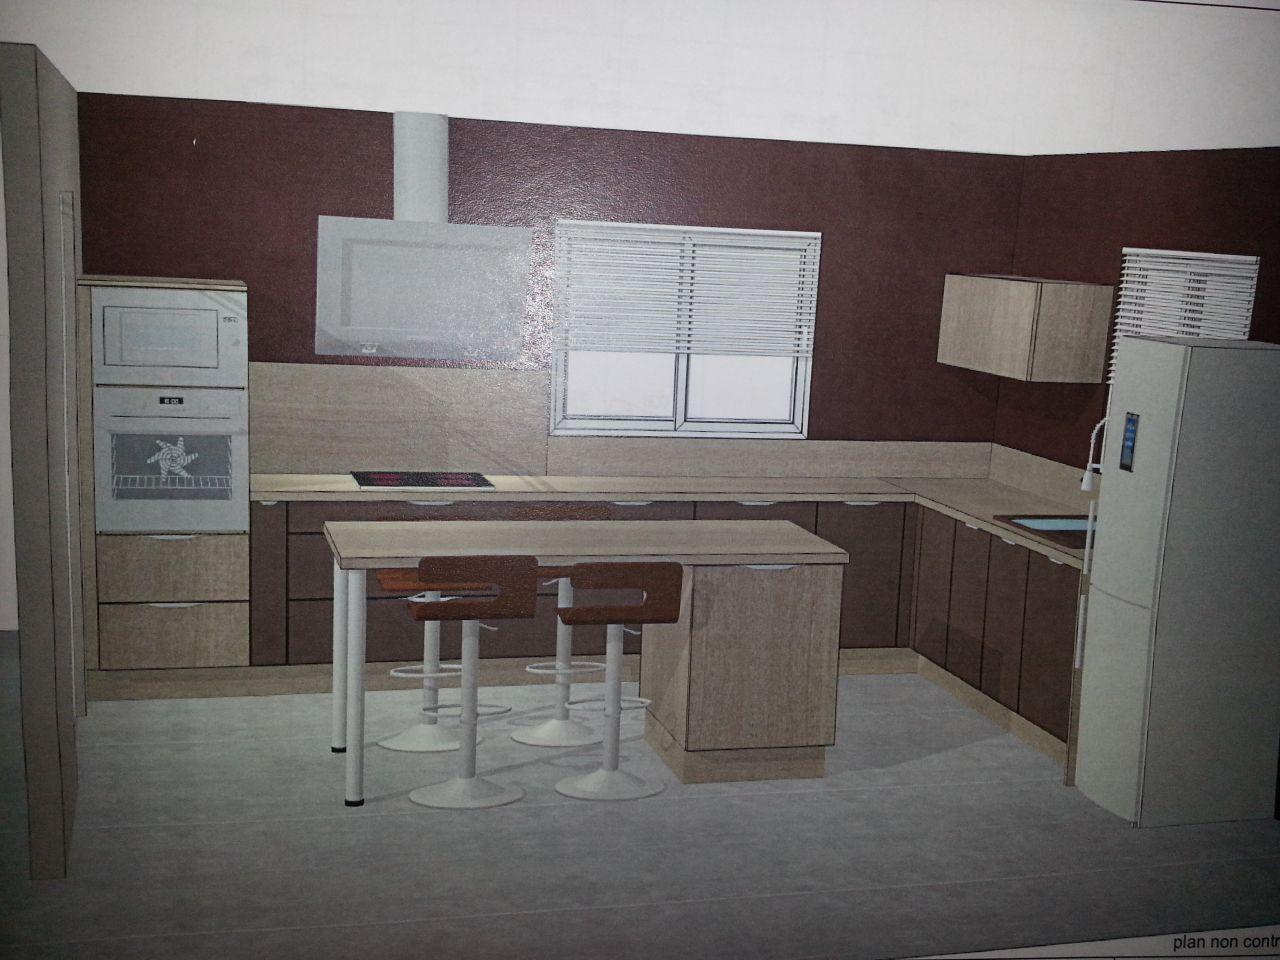 les projets implantation de vos cuisines 8838 messages. Black Bedroom Furniture Sets. Home Design Ideas